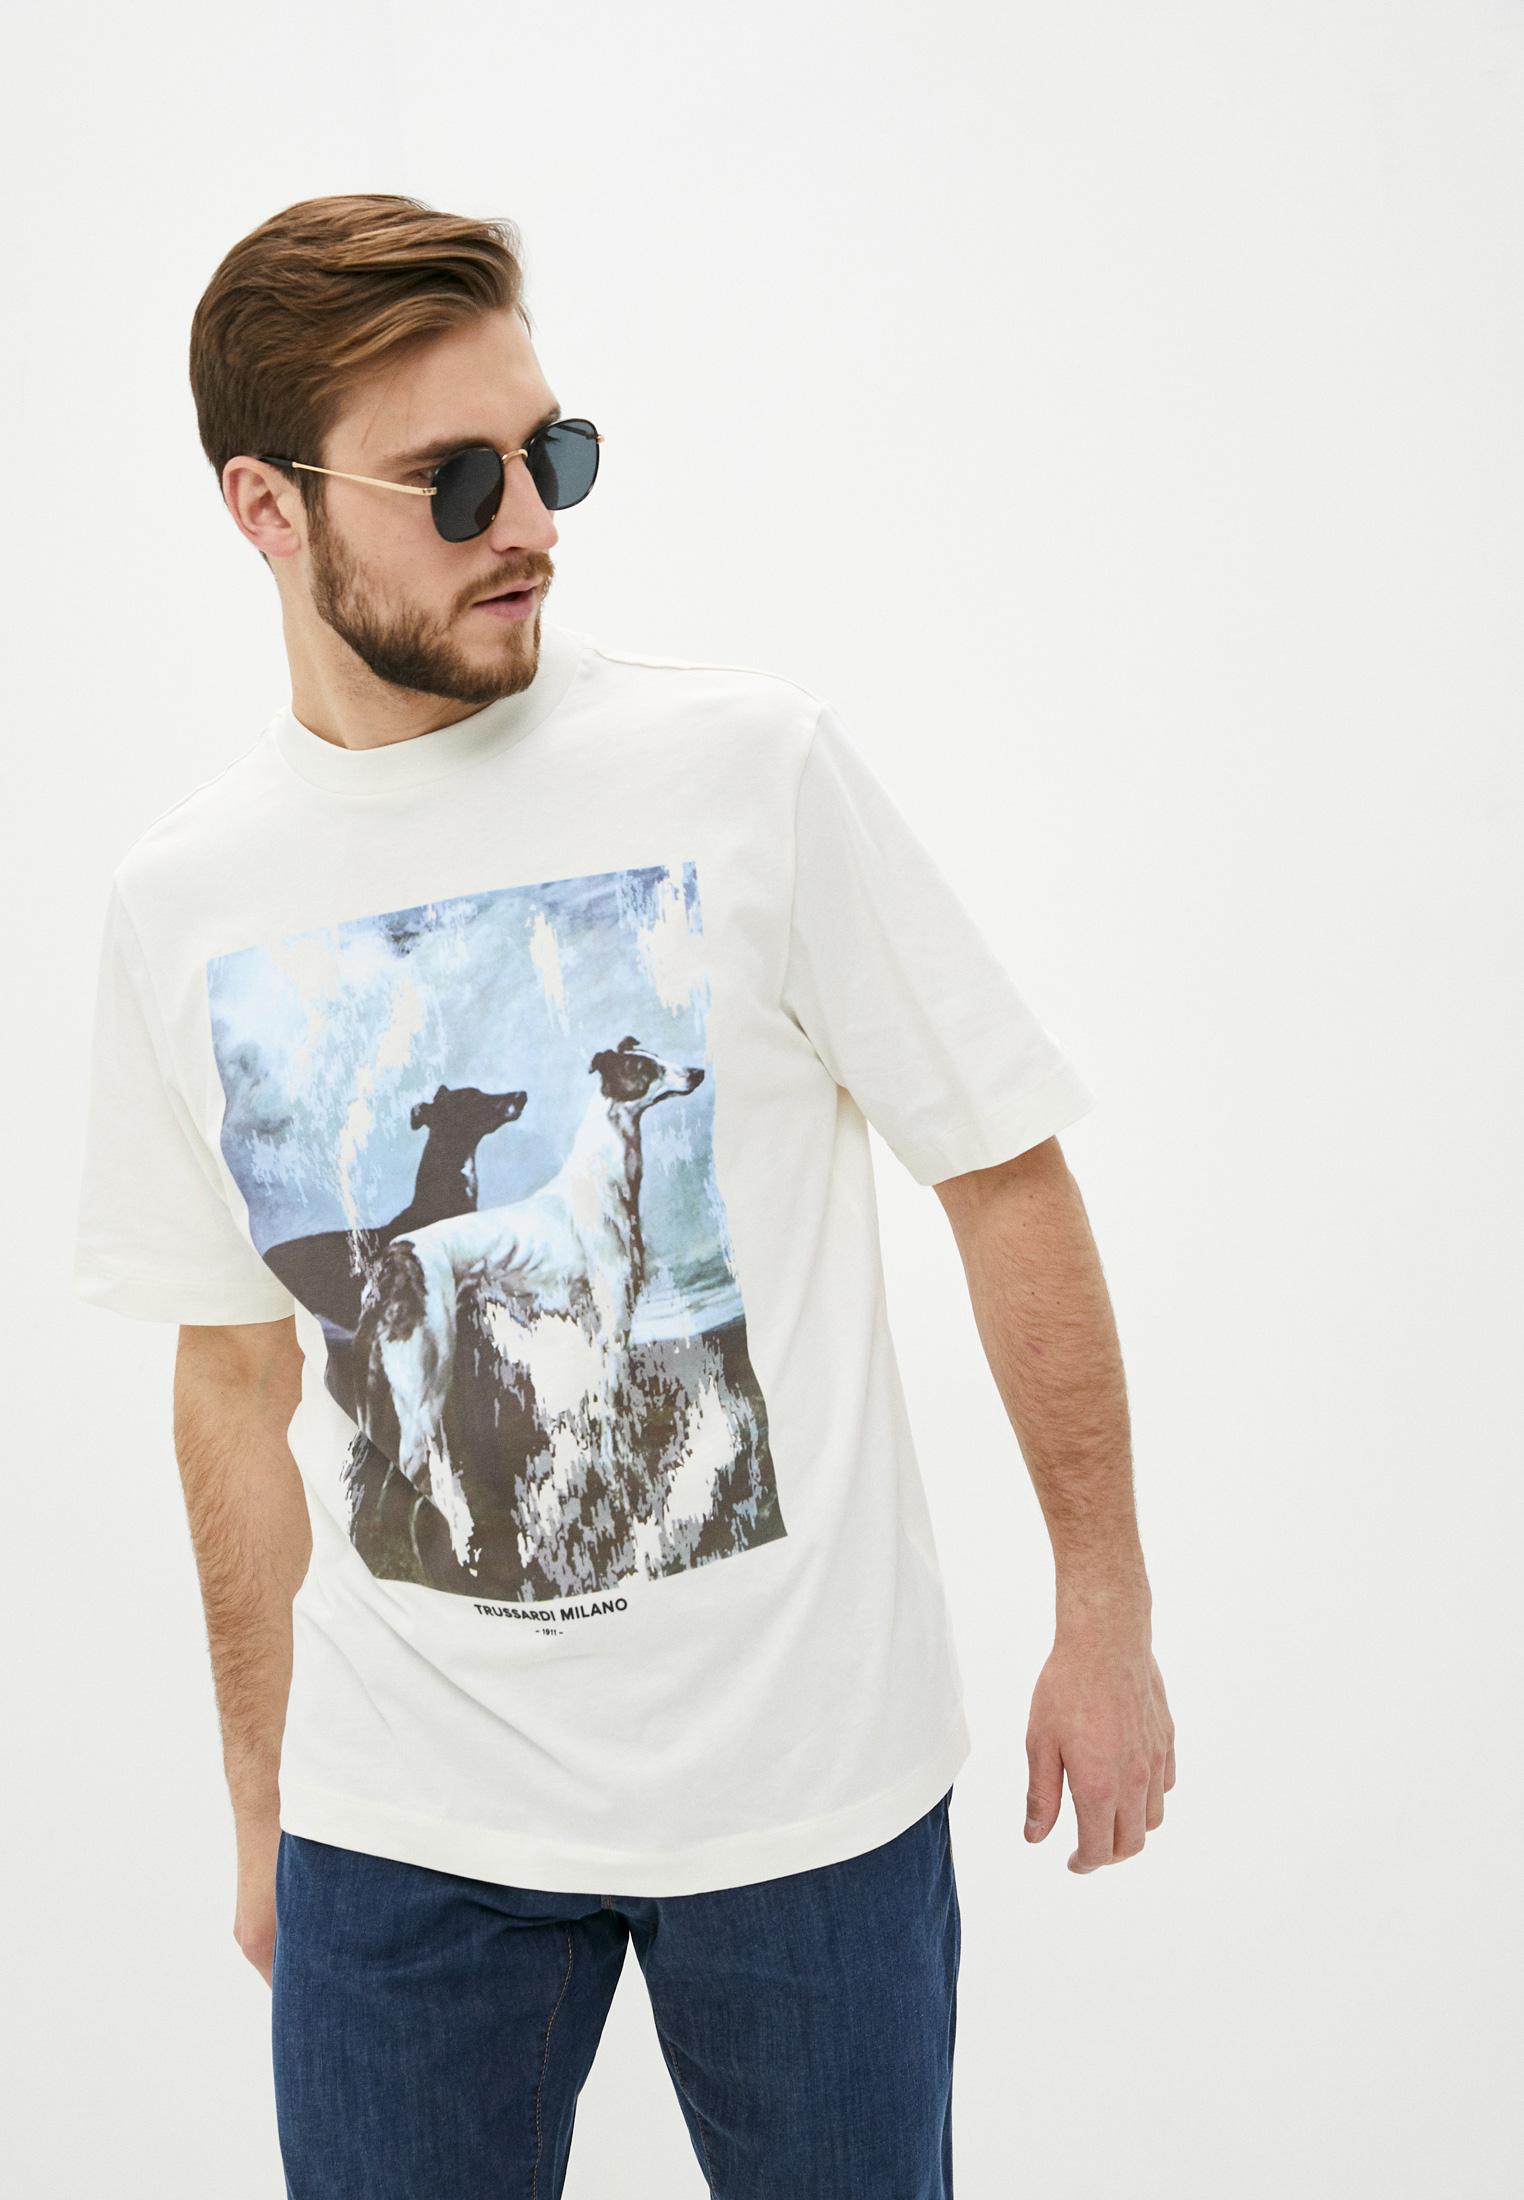 Мужская футболка Trussardi (Труссарди) 52T00455-1T005053: изображение 1